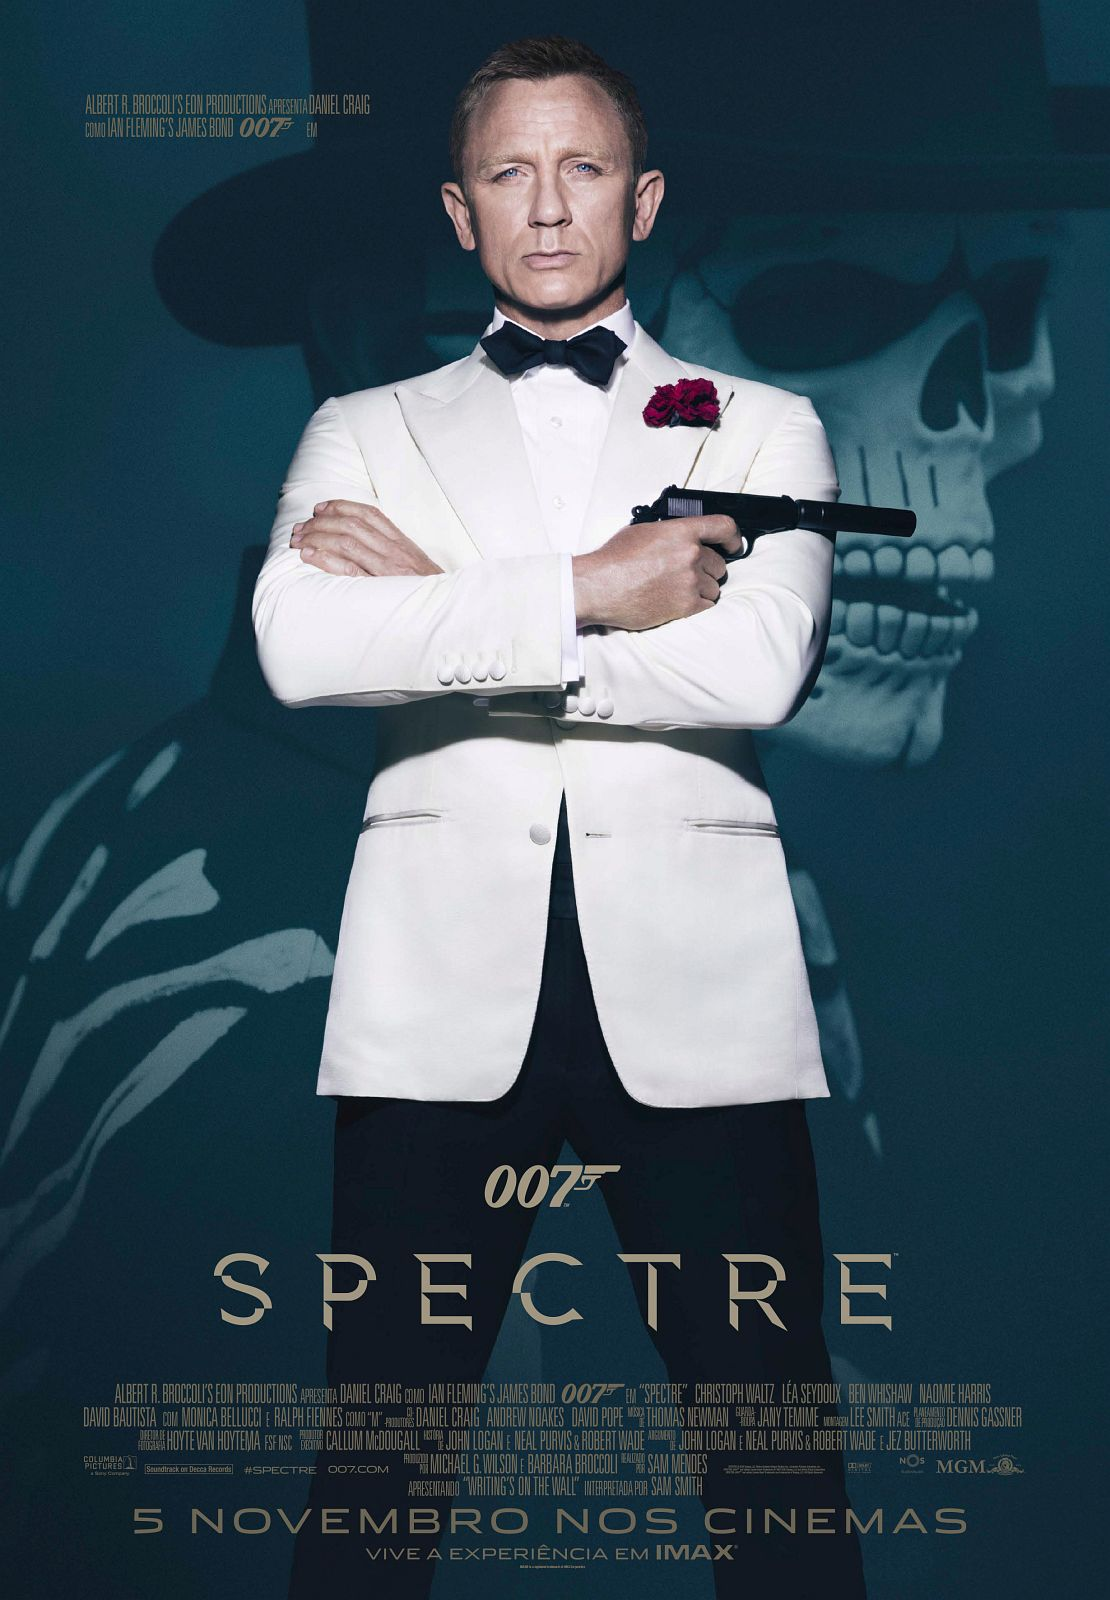 007_Spectre_posterFinal_68X98_PT_S